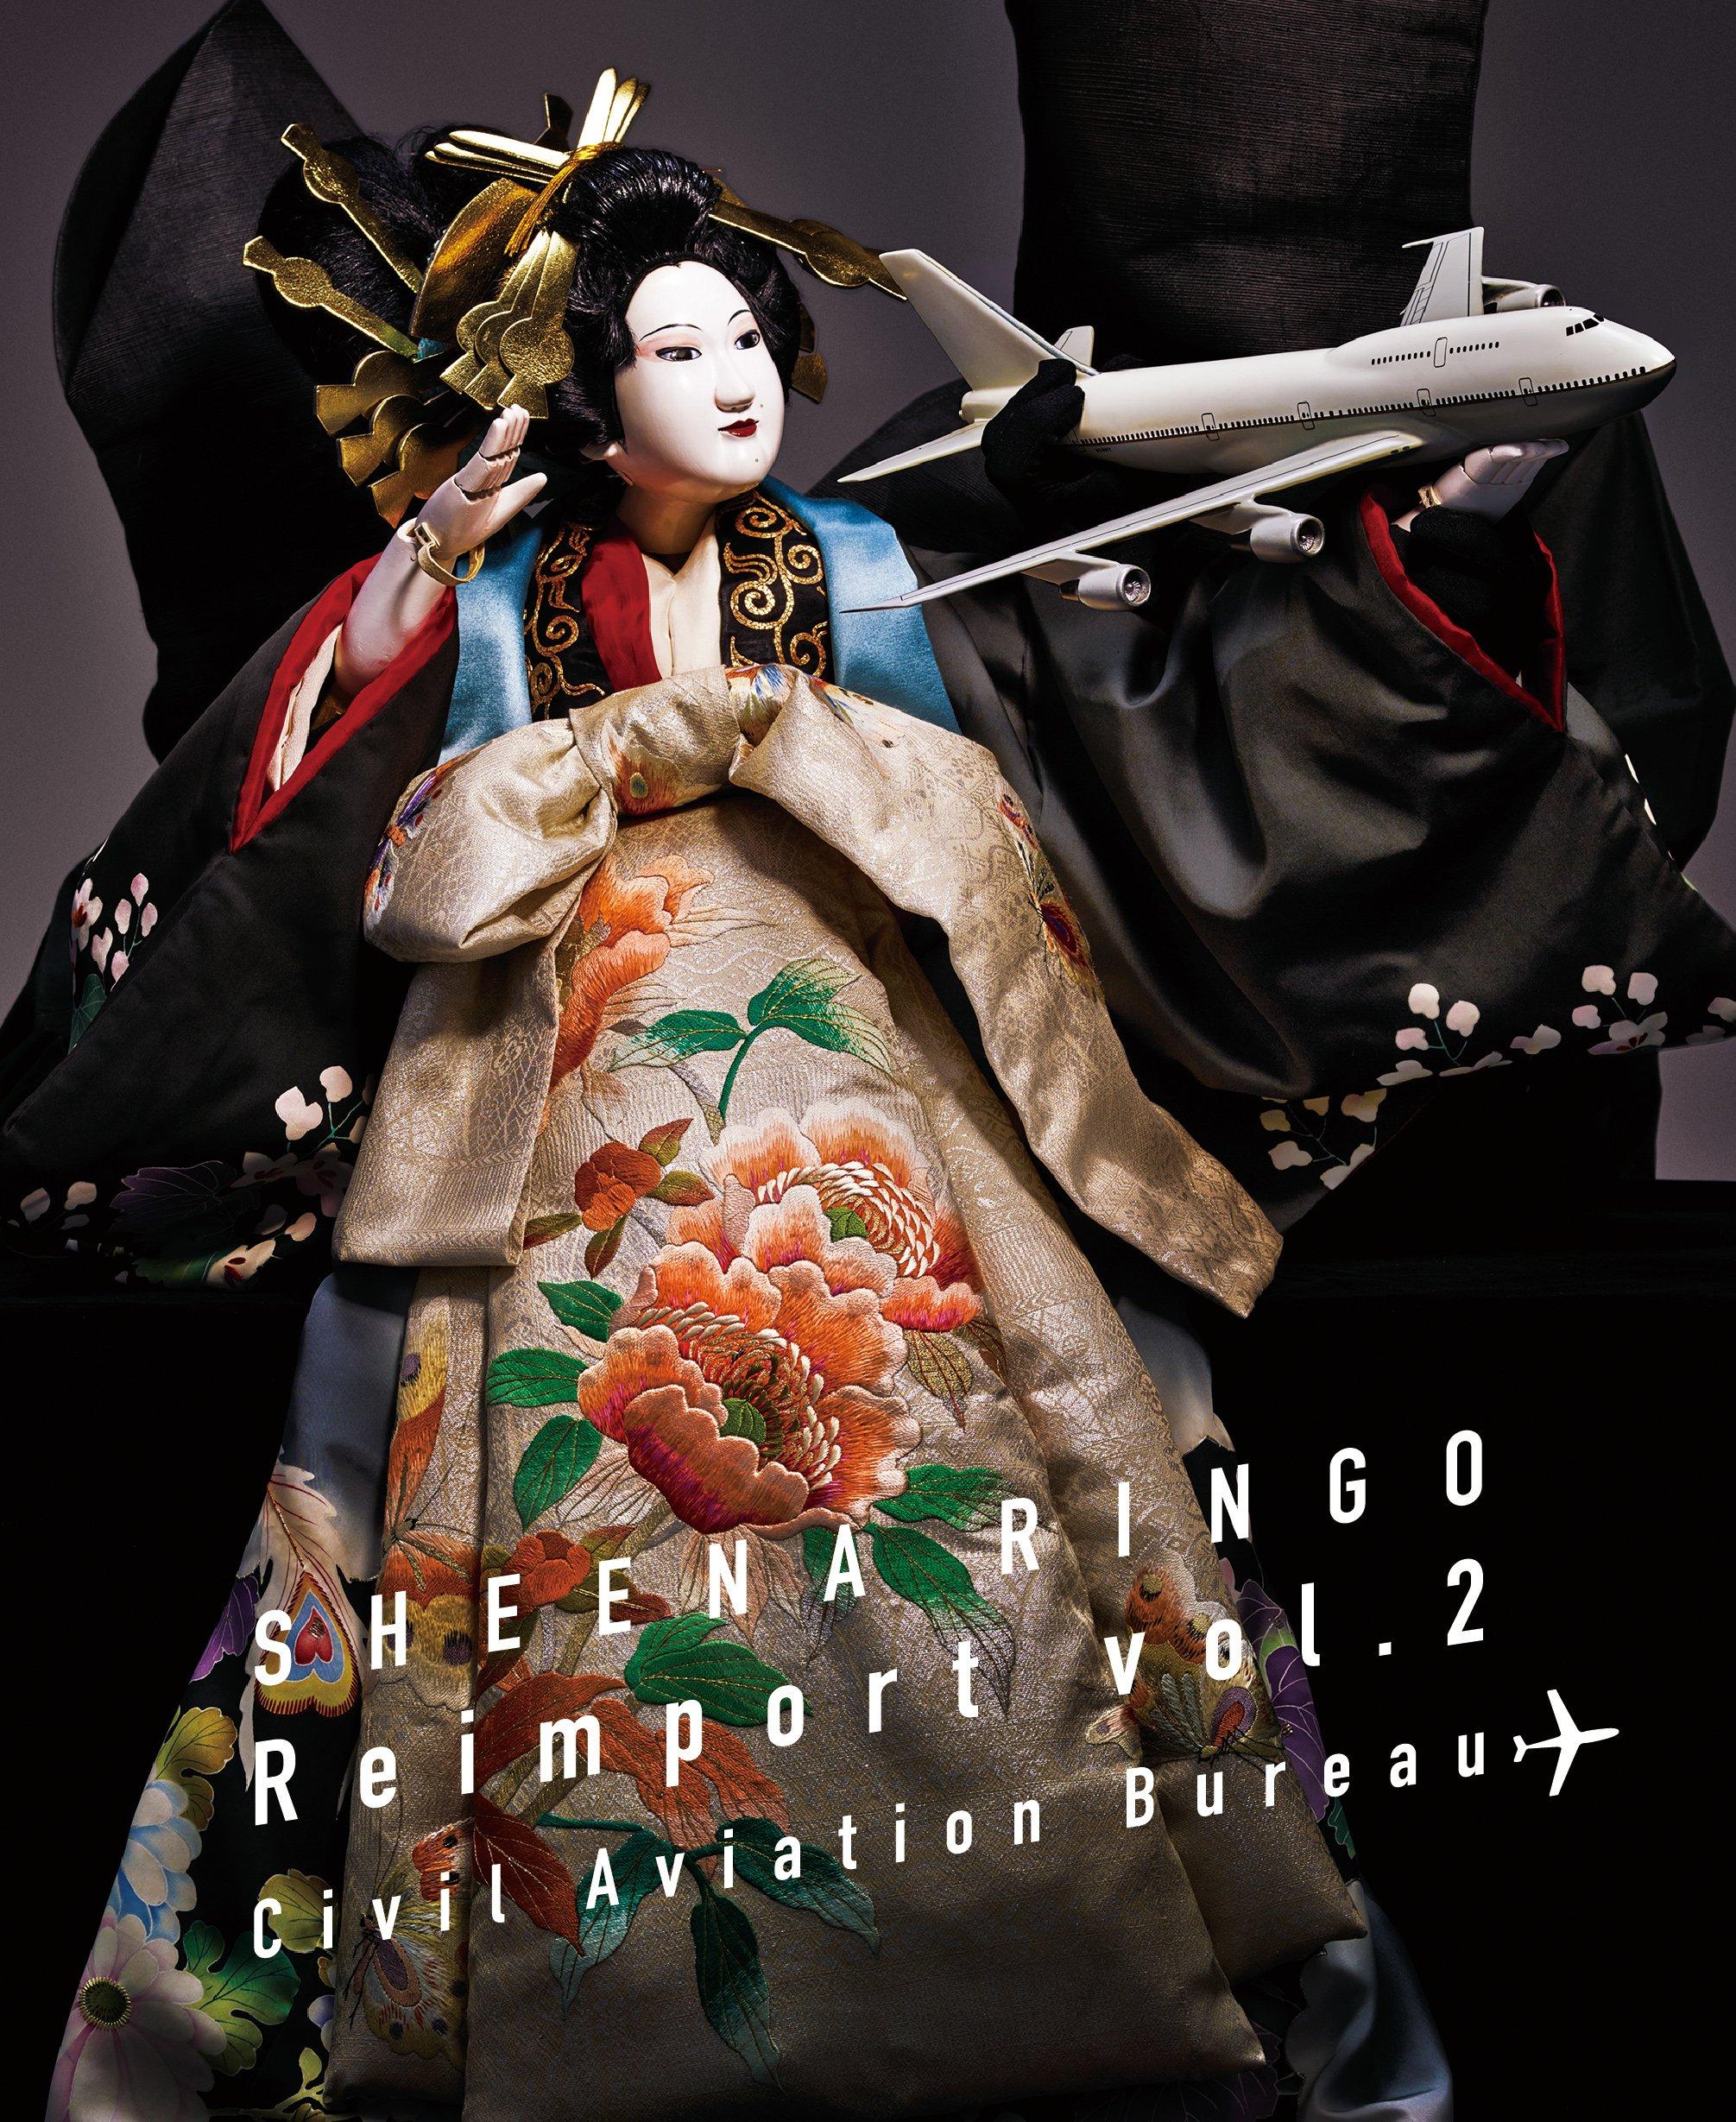 椎名林檎 (Shiina Ringo) – 逆輸入 〜航空局〜 vol.2 [FLAC + AAC / CD] [2017.12.06]